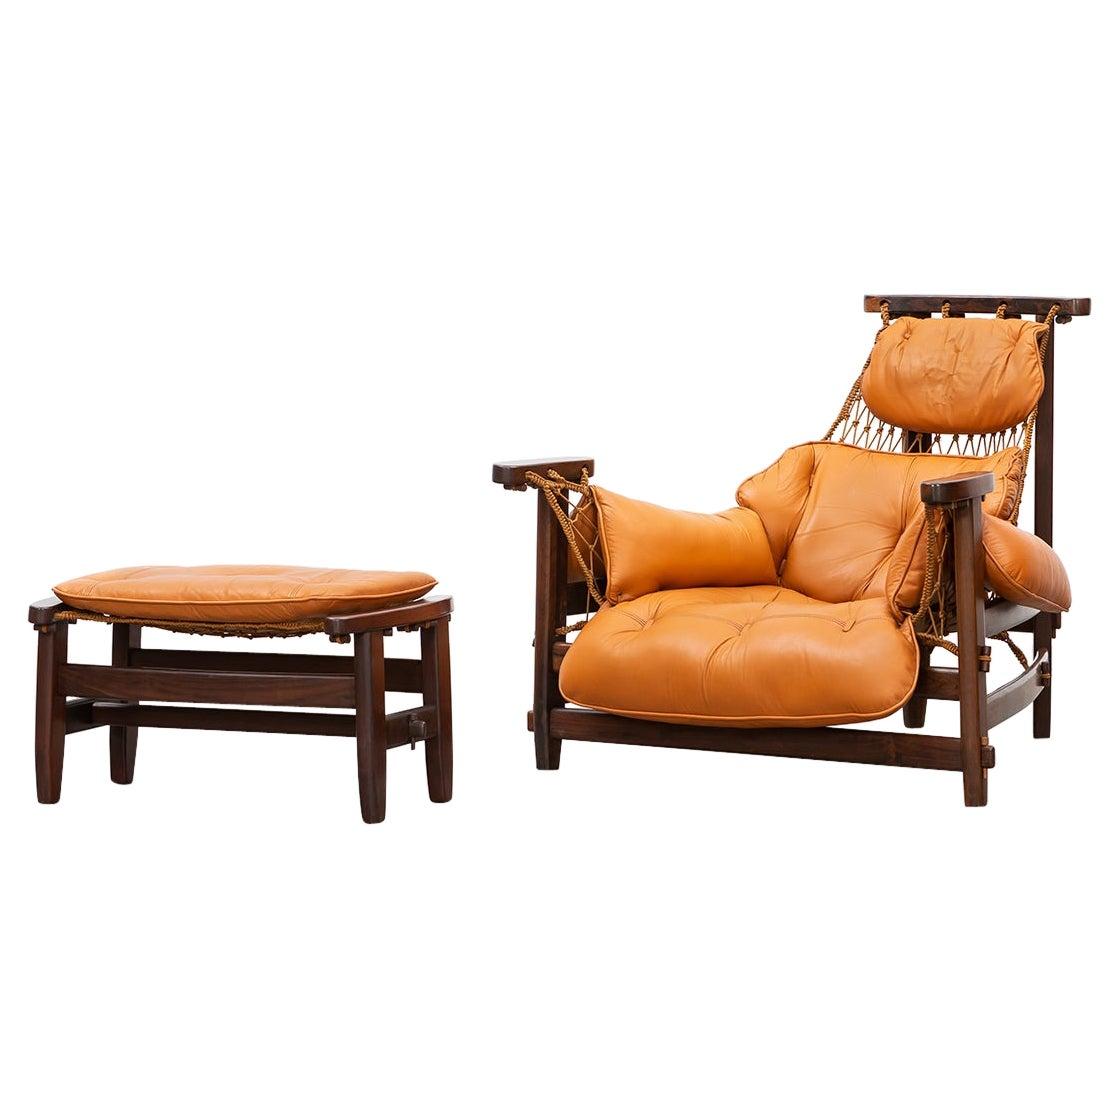 1960s Jacaranda, Leather Cushion Lounge Chair and Ottoman by Jean Gillon